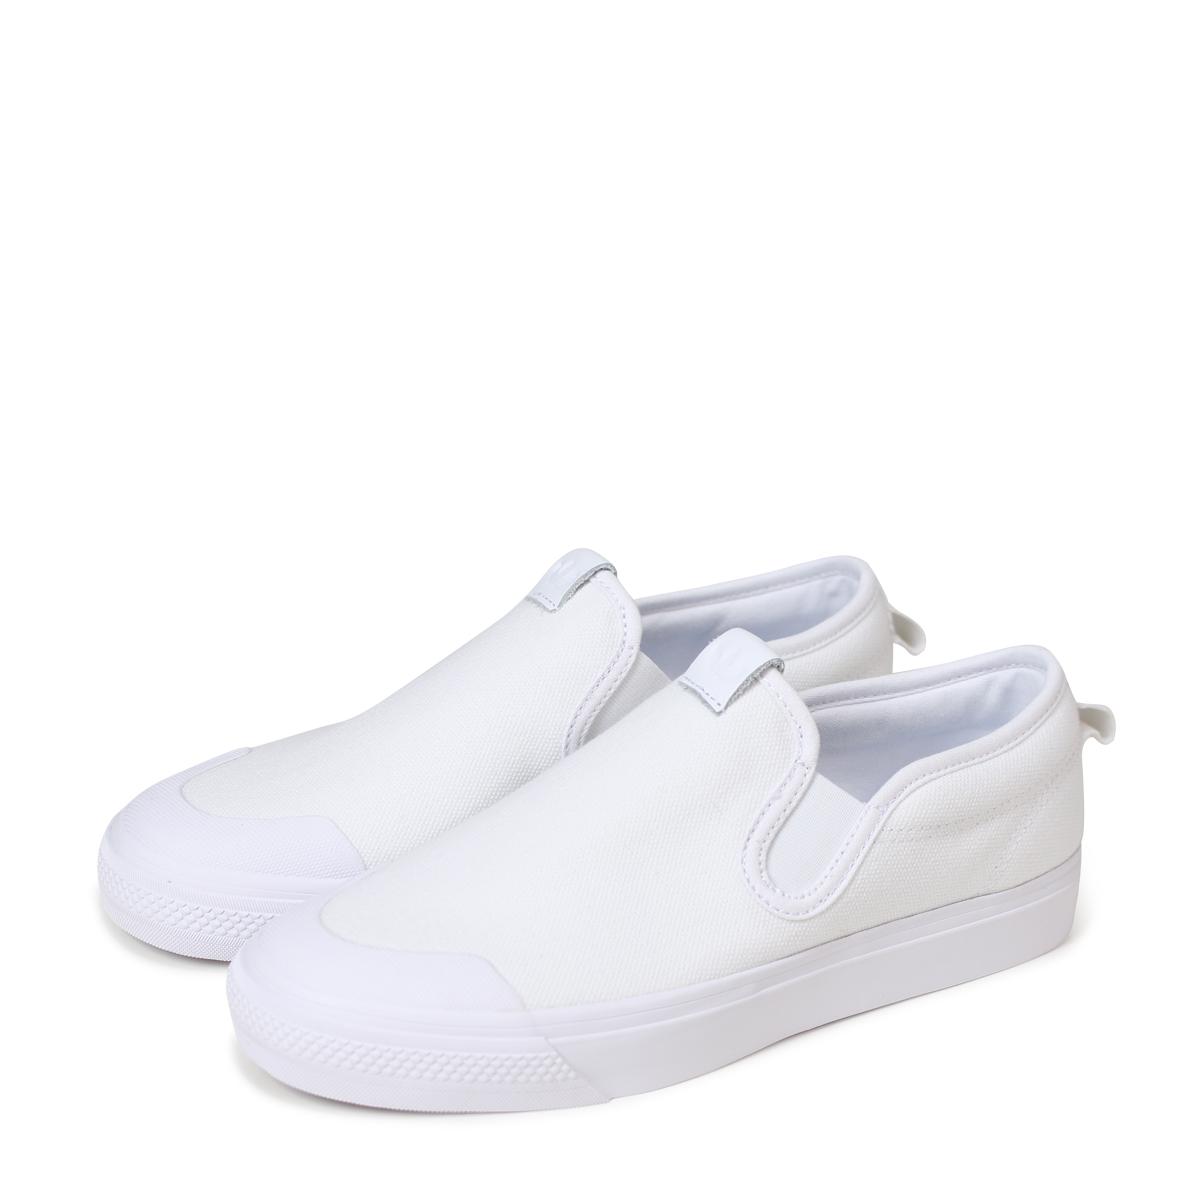 Originals White Slipon Ons W Cq3103185 Dis Nitze Sneakers Nizza Slip That Adidas vY6ybgf7